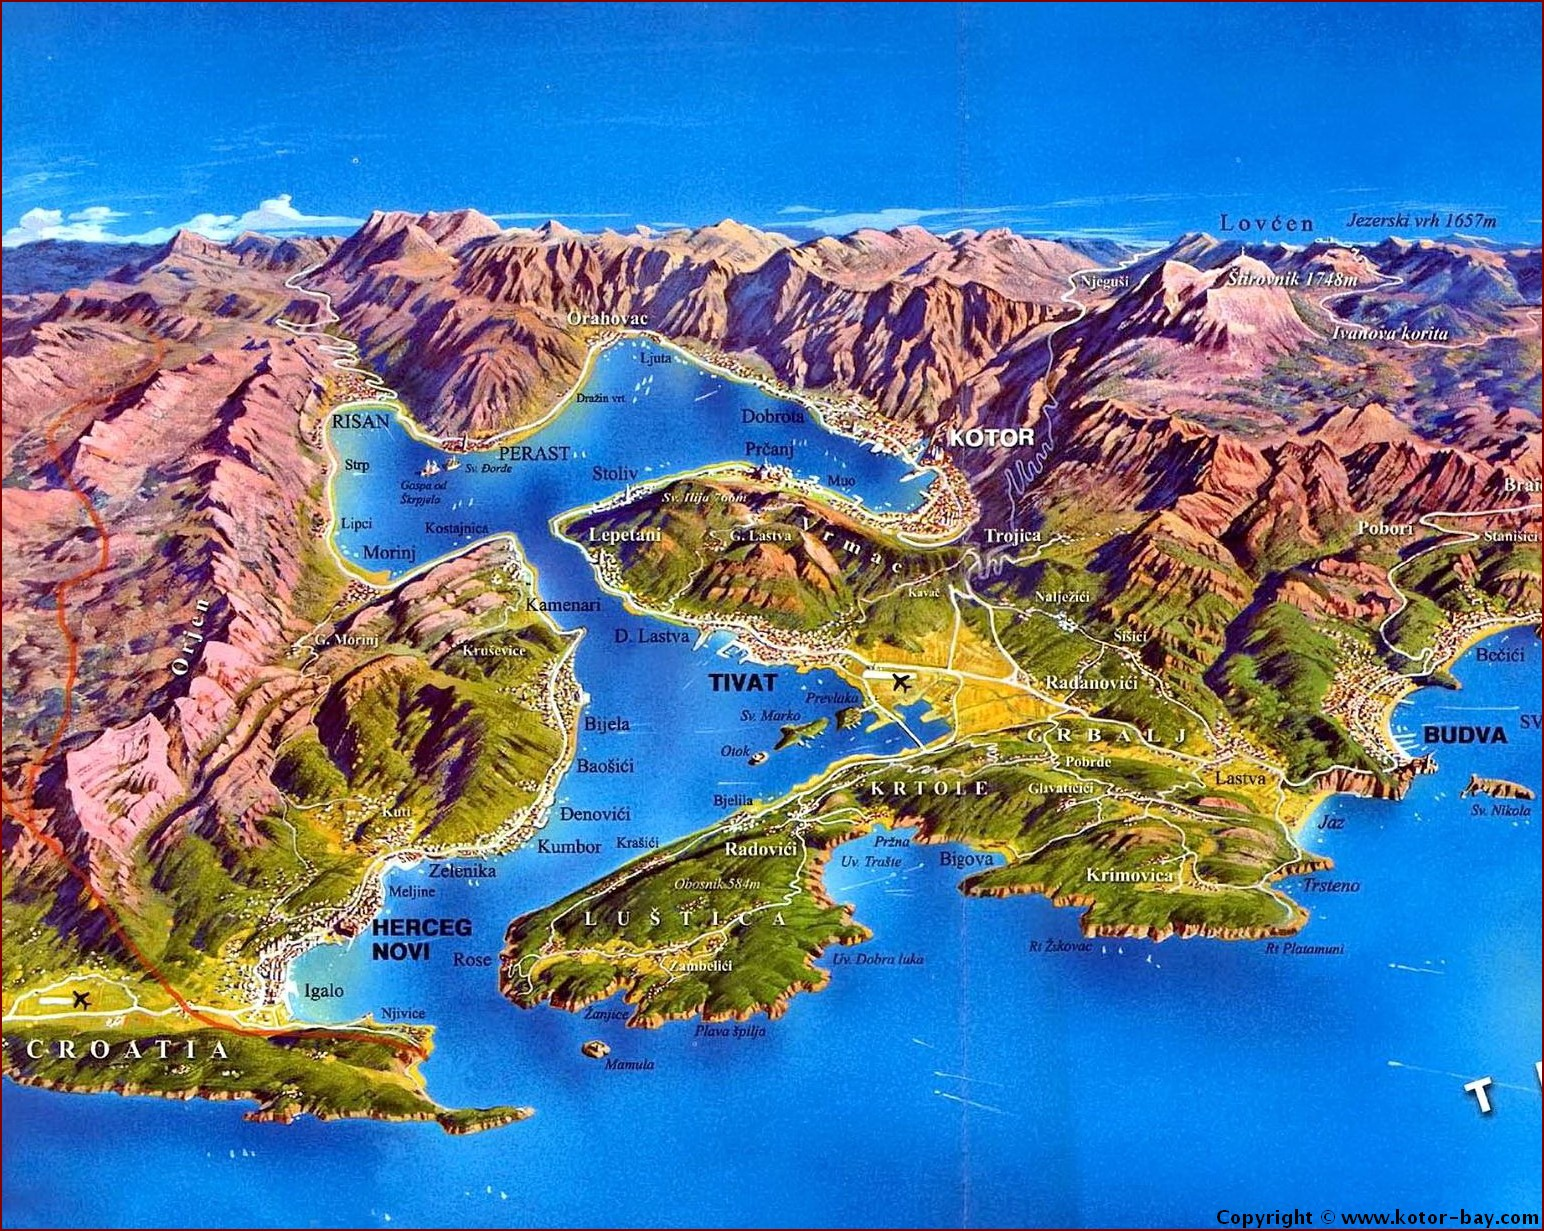 Porto Montenegro Karte.Kotor Montenegro Mini Budva Tivat Datasheet